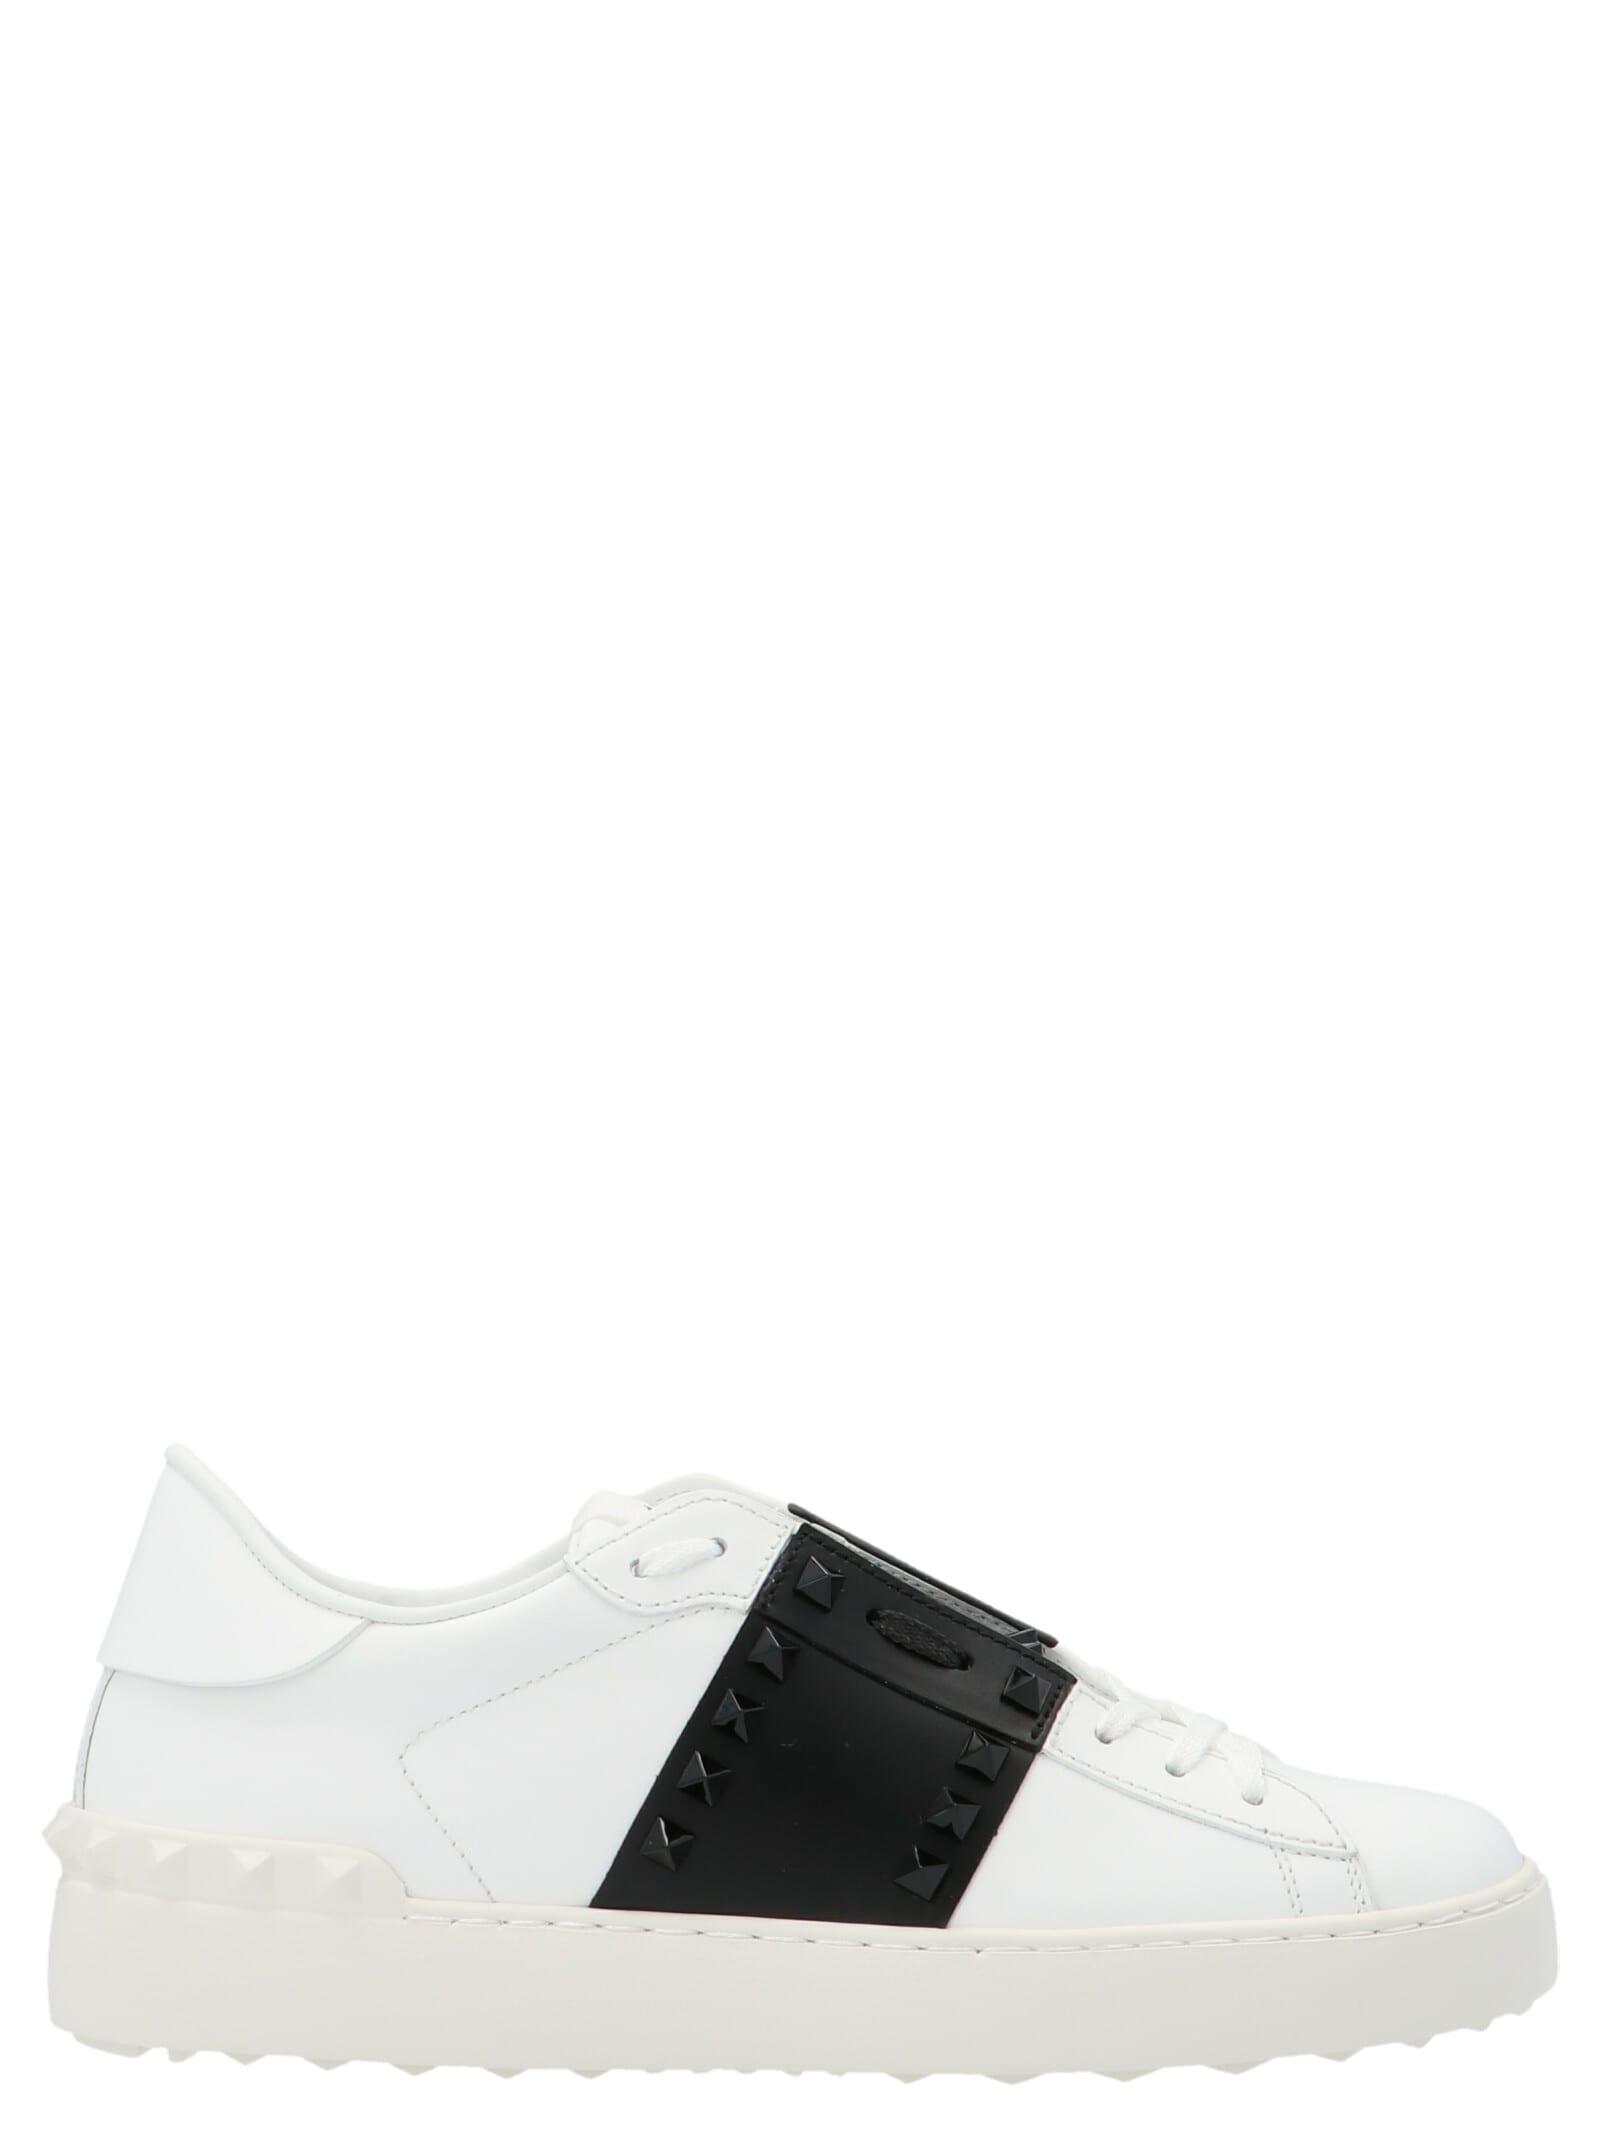 Valentino Garavani untitled Shoes